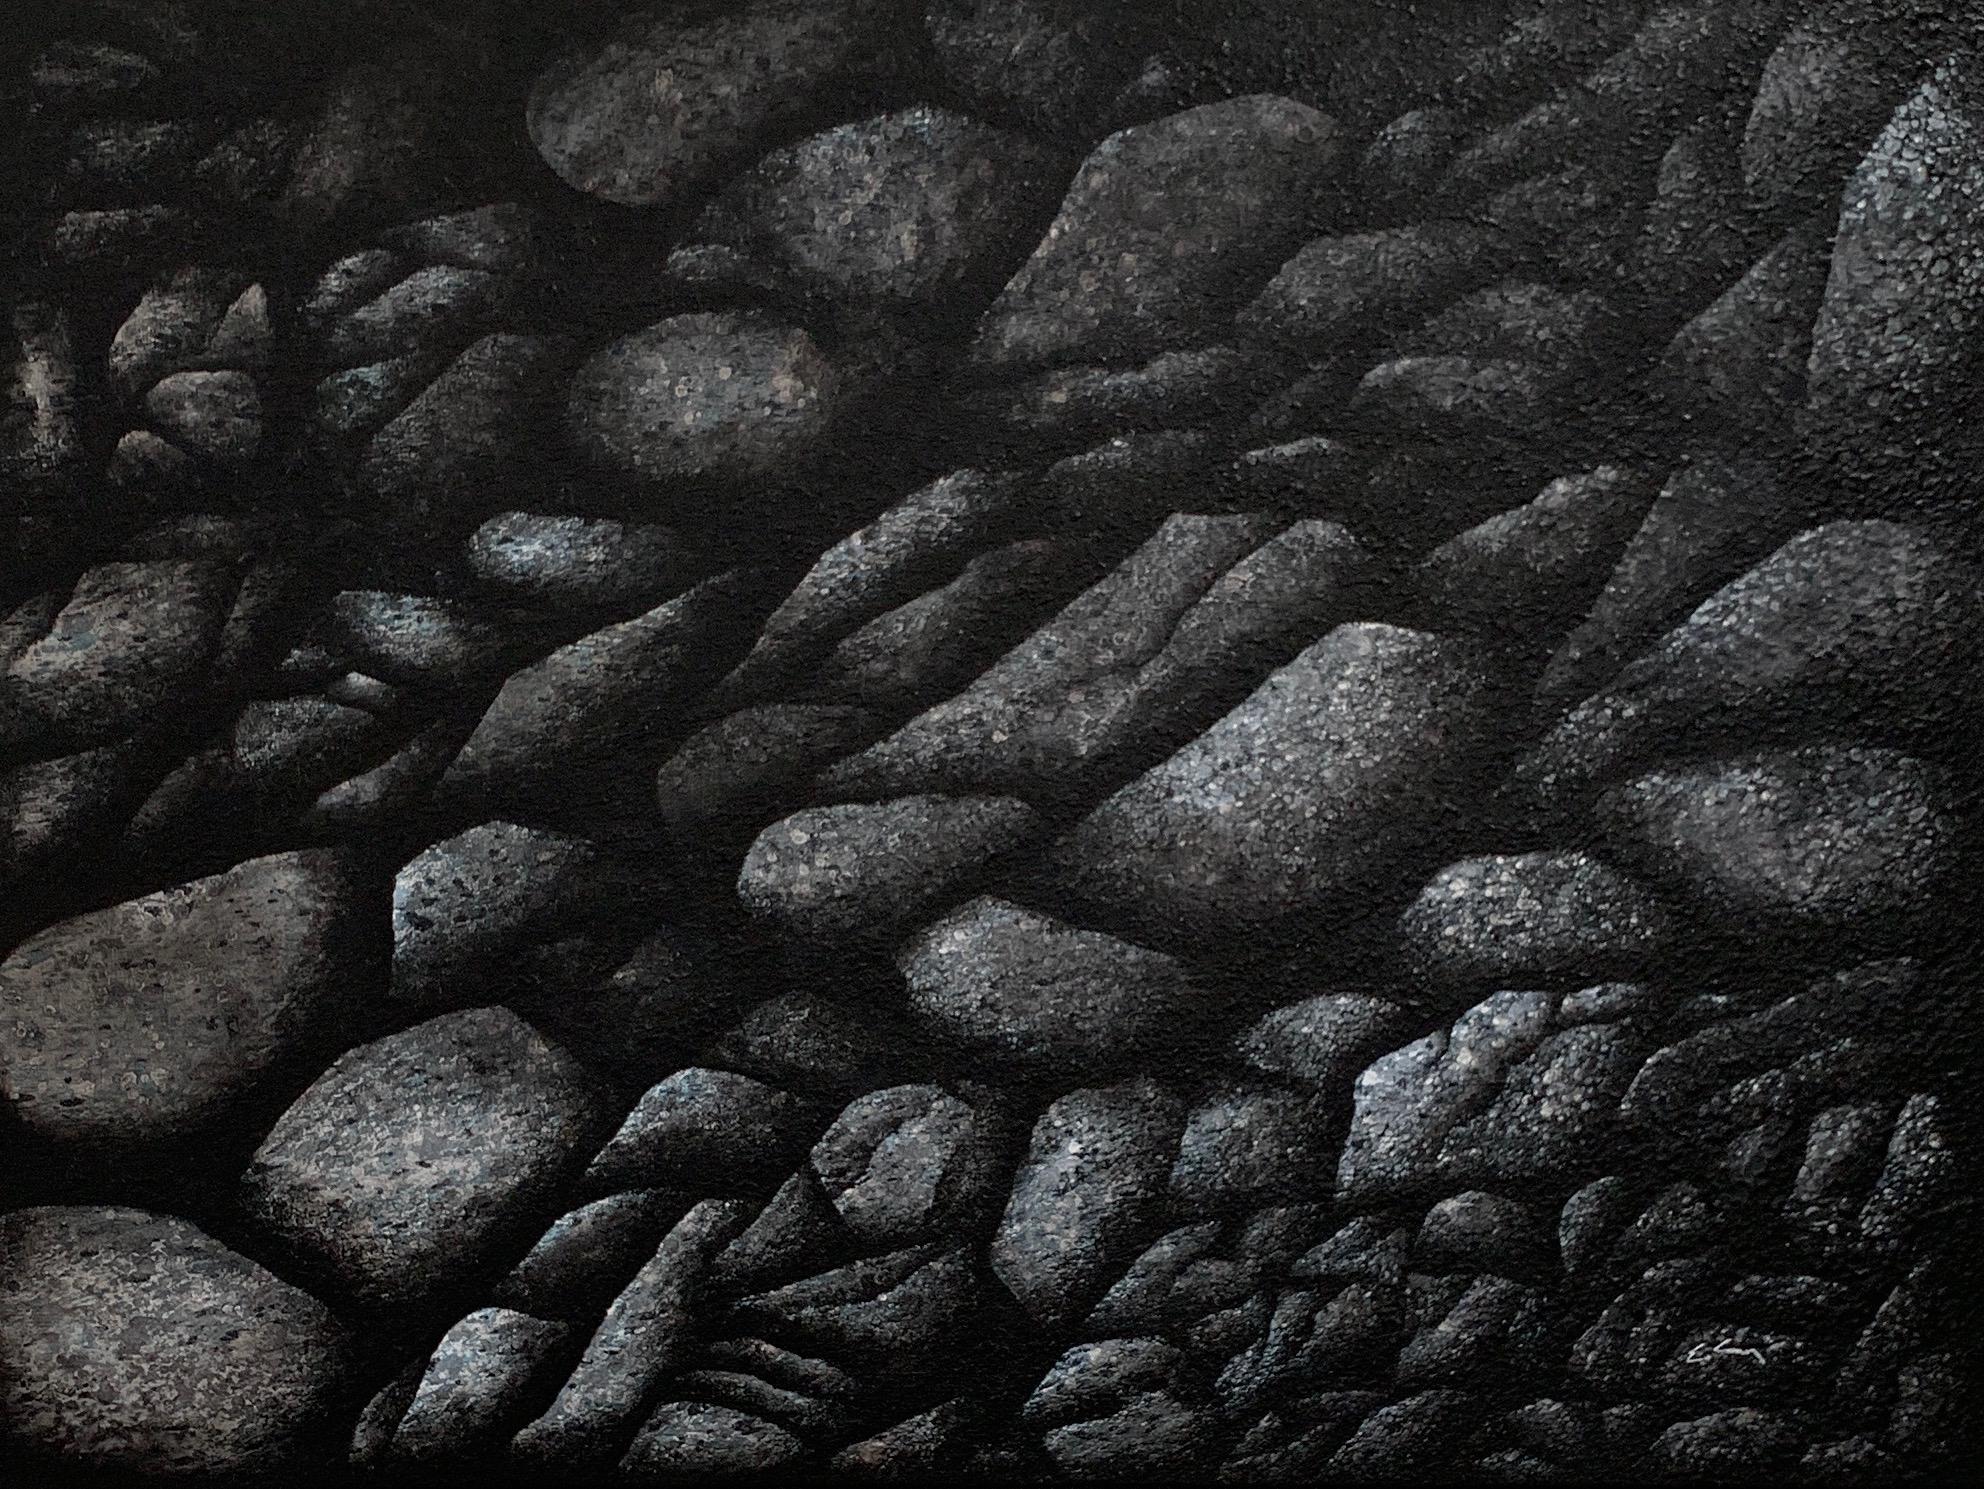 """Assemblage of Ashy Rocks"""